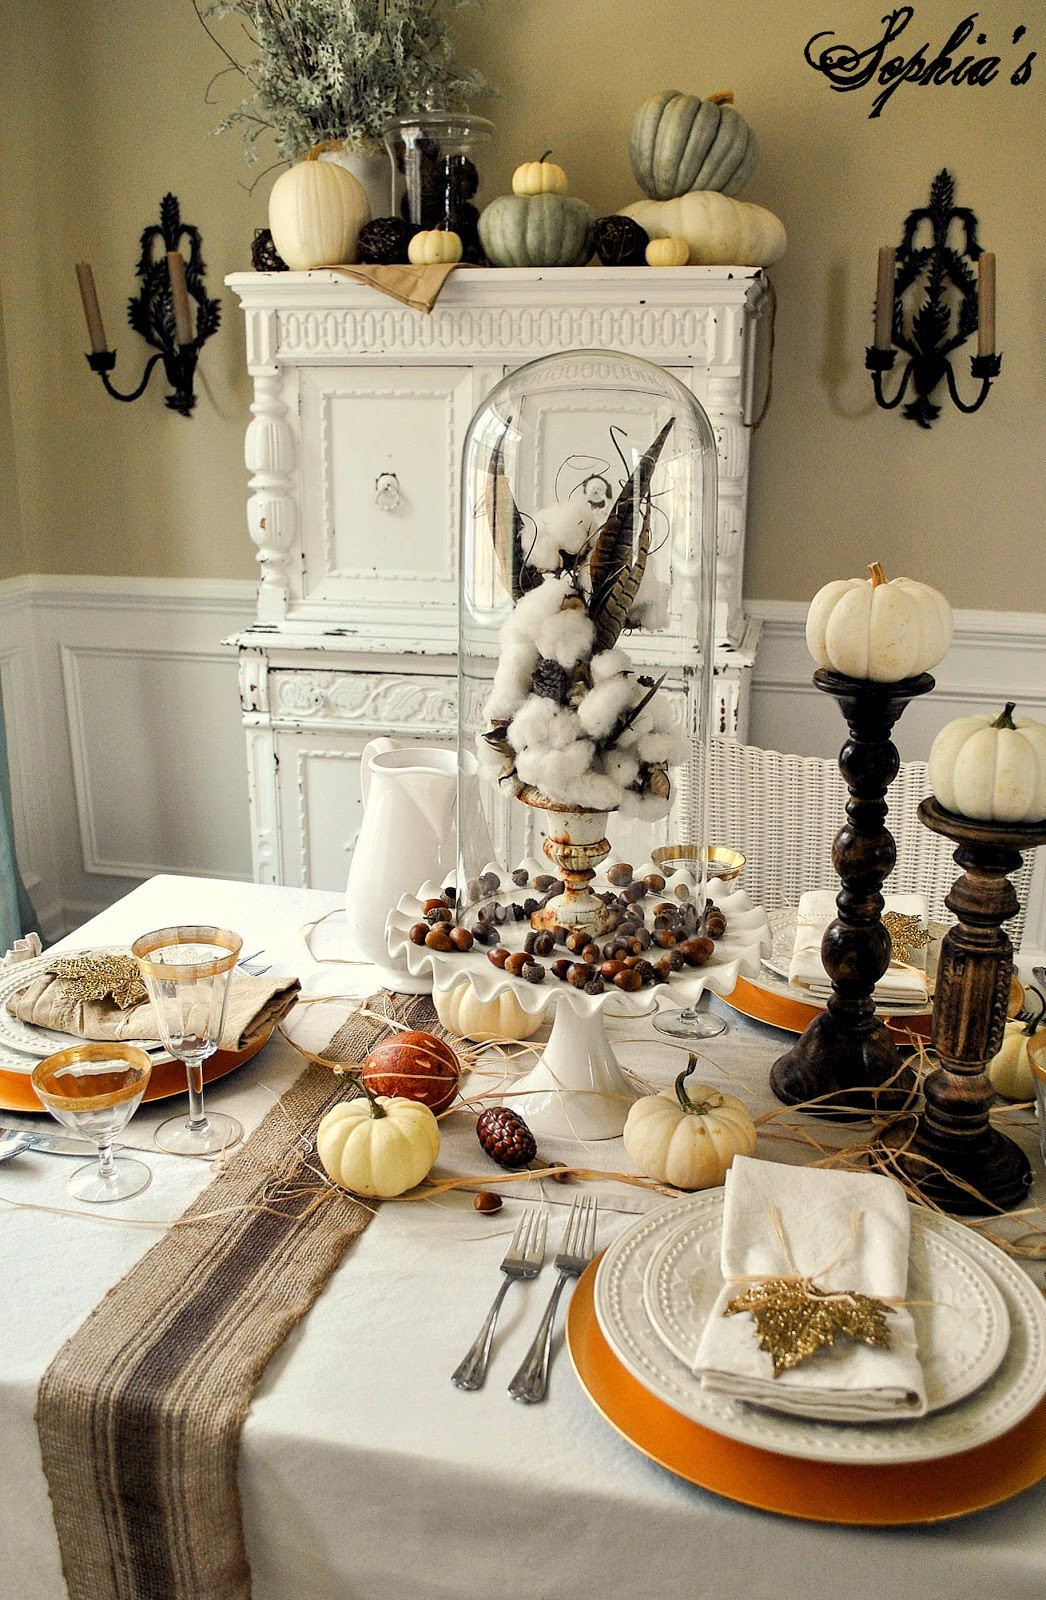 Thanksgiving Table Decor Ideas  Sophia s Thanksgiving Table Setting